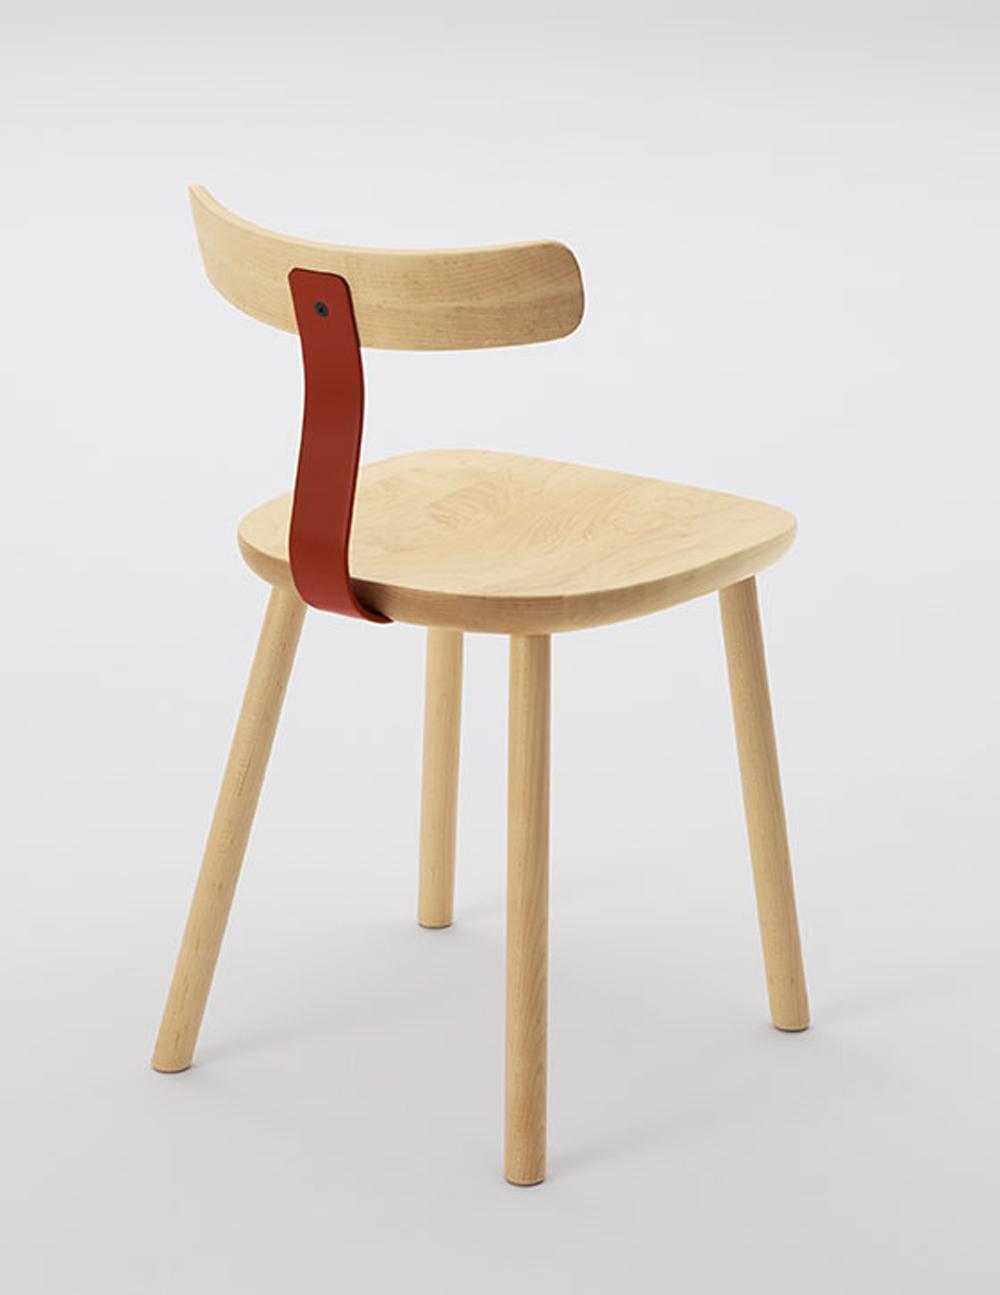 marzua t1 chair silla de jasper morrison para maruni. Black Bedroom Furniture Sets. Home Design Ideas